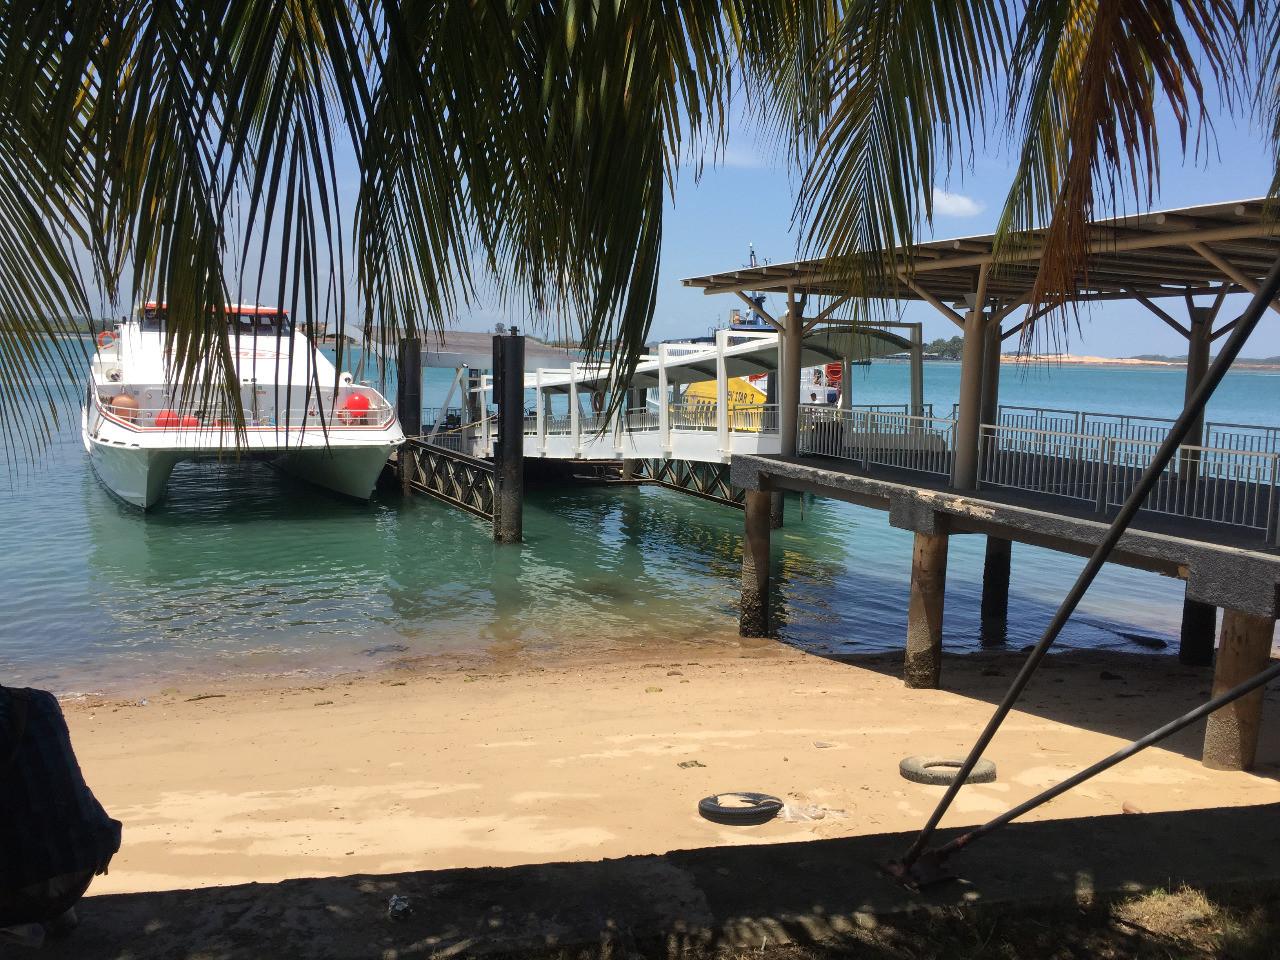 COVID-19: Batam ferry terminal mulls suspending operations amid declining income